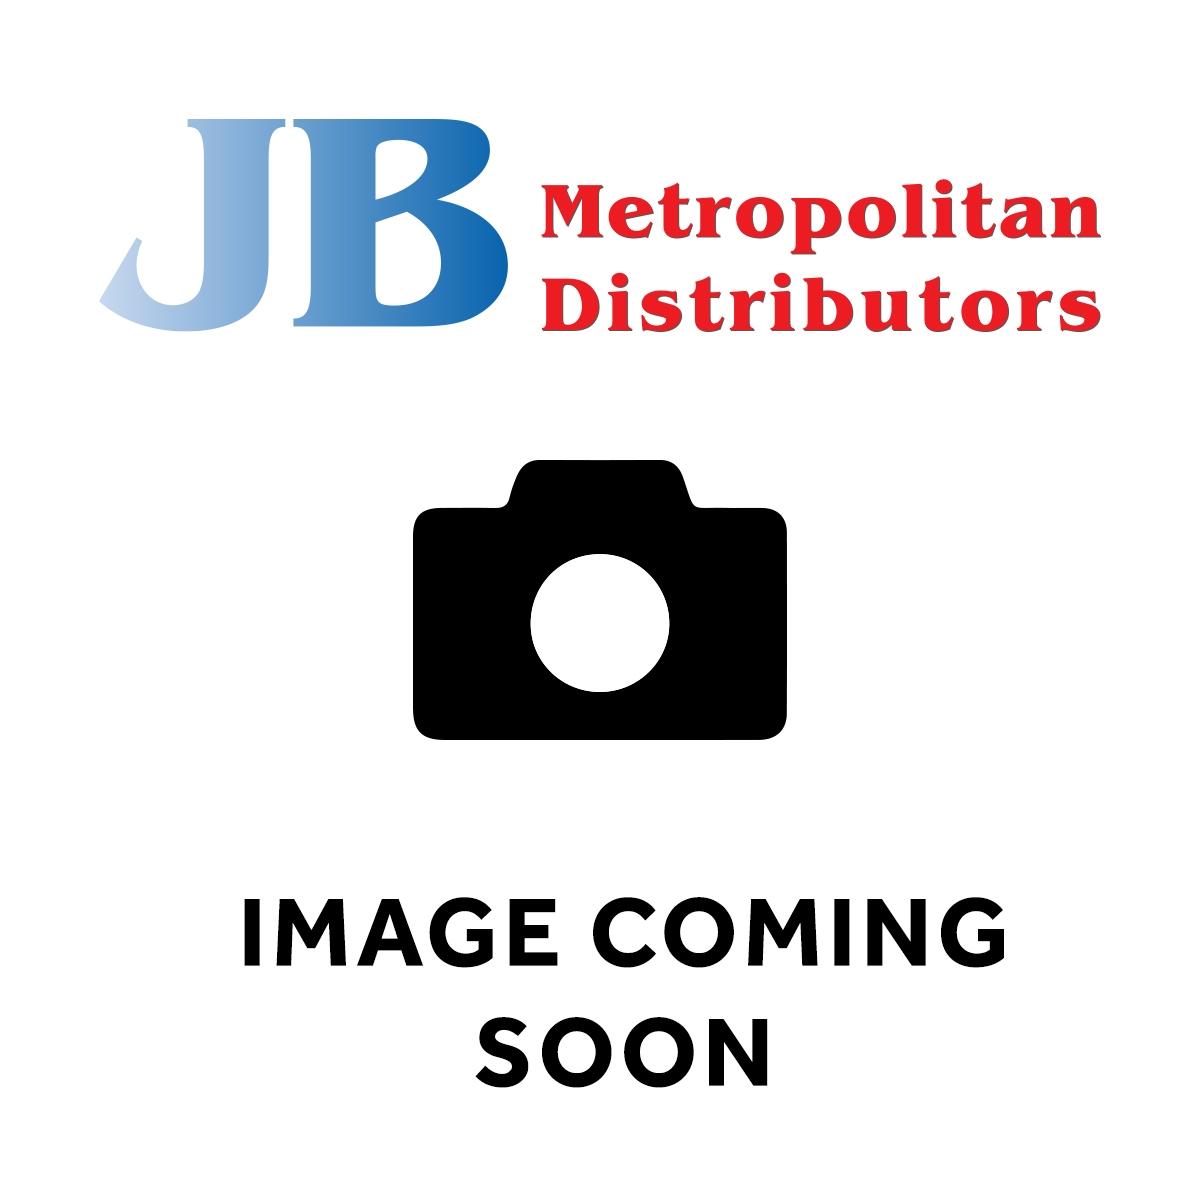 350G ARNOTTS FARMBAKE CHOCOLATE CHIP FUDGE